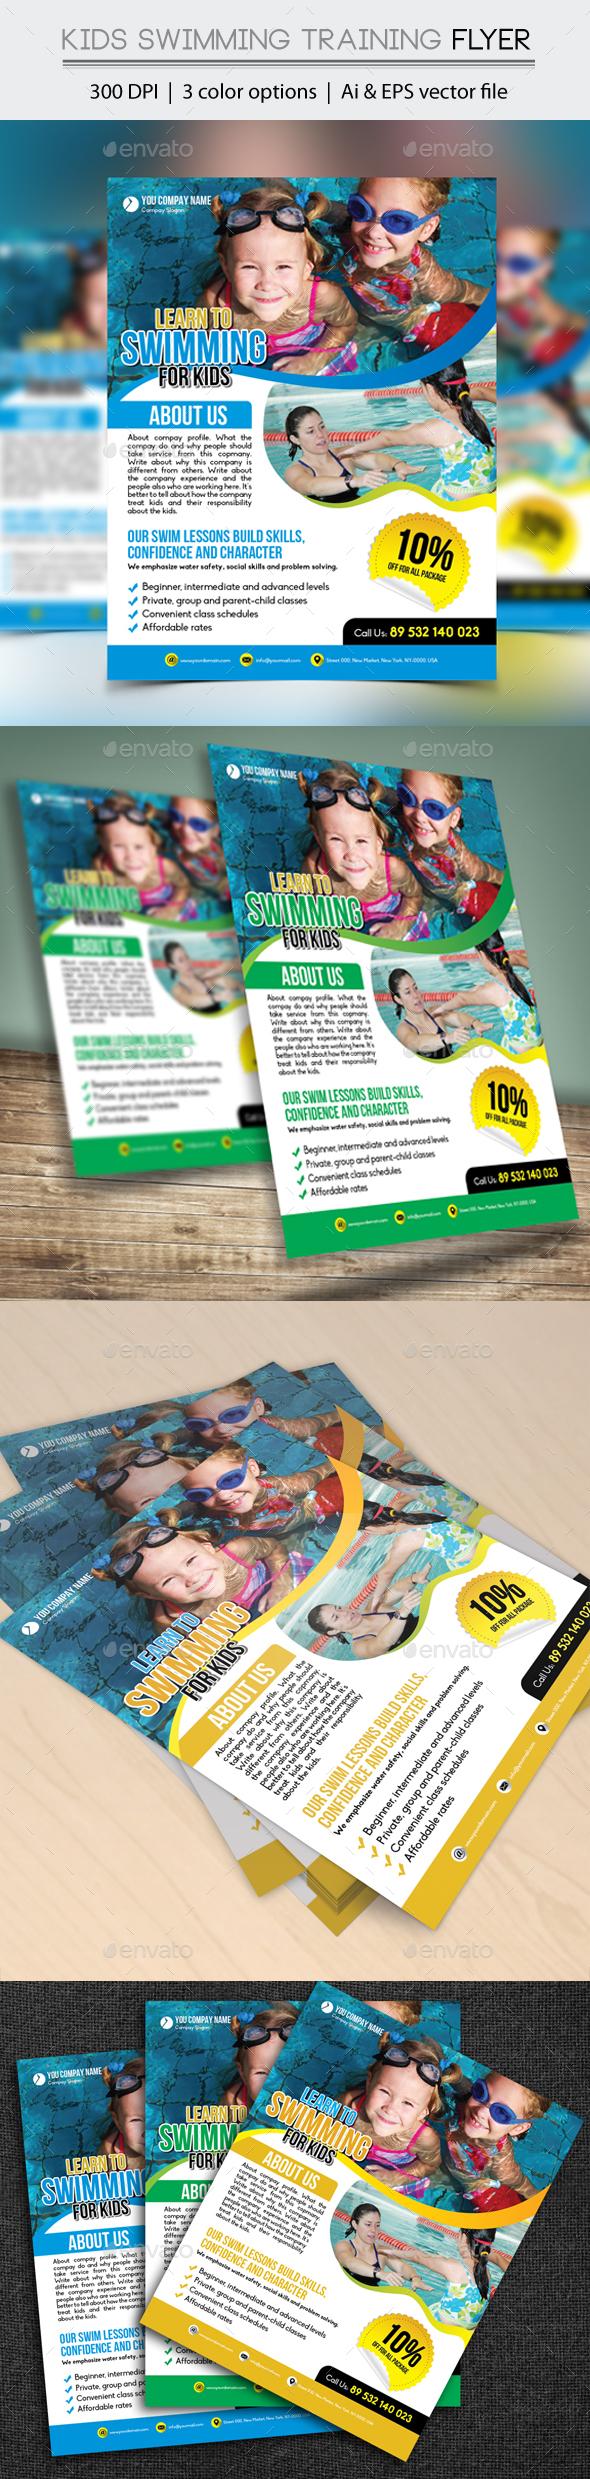 Kids Swimming Training Flyer - Flyers Print Templates